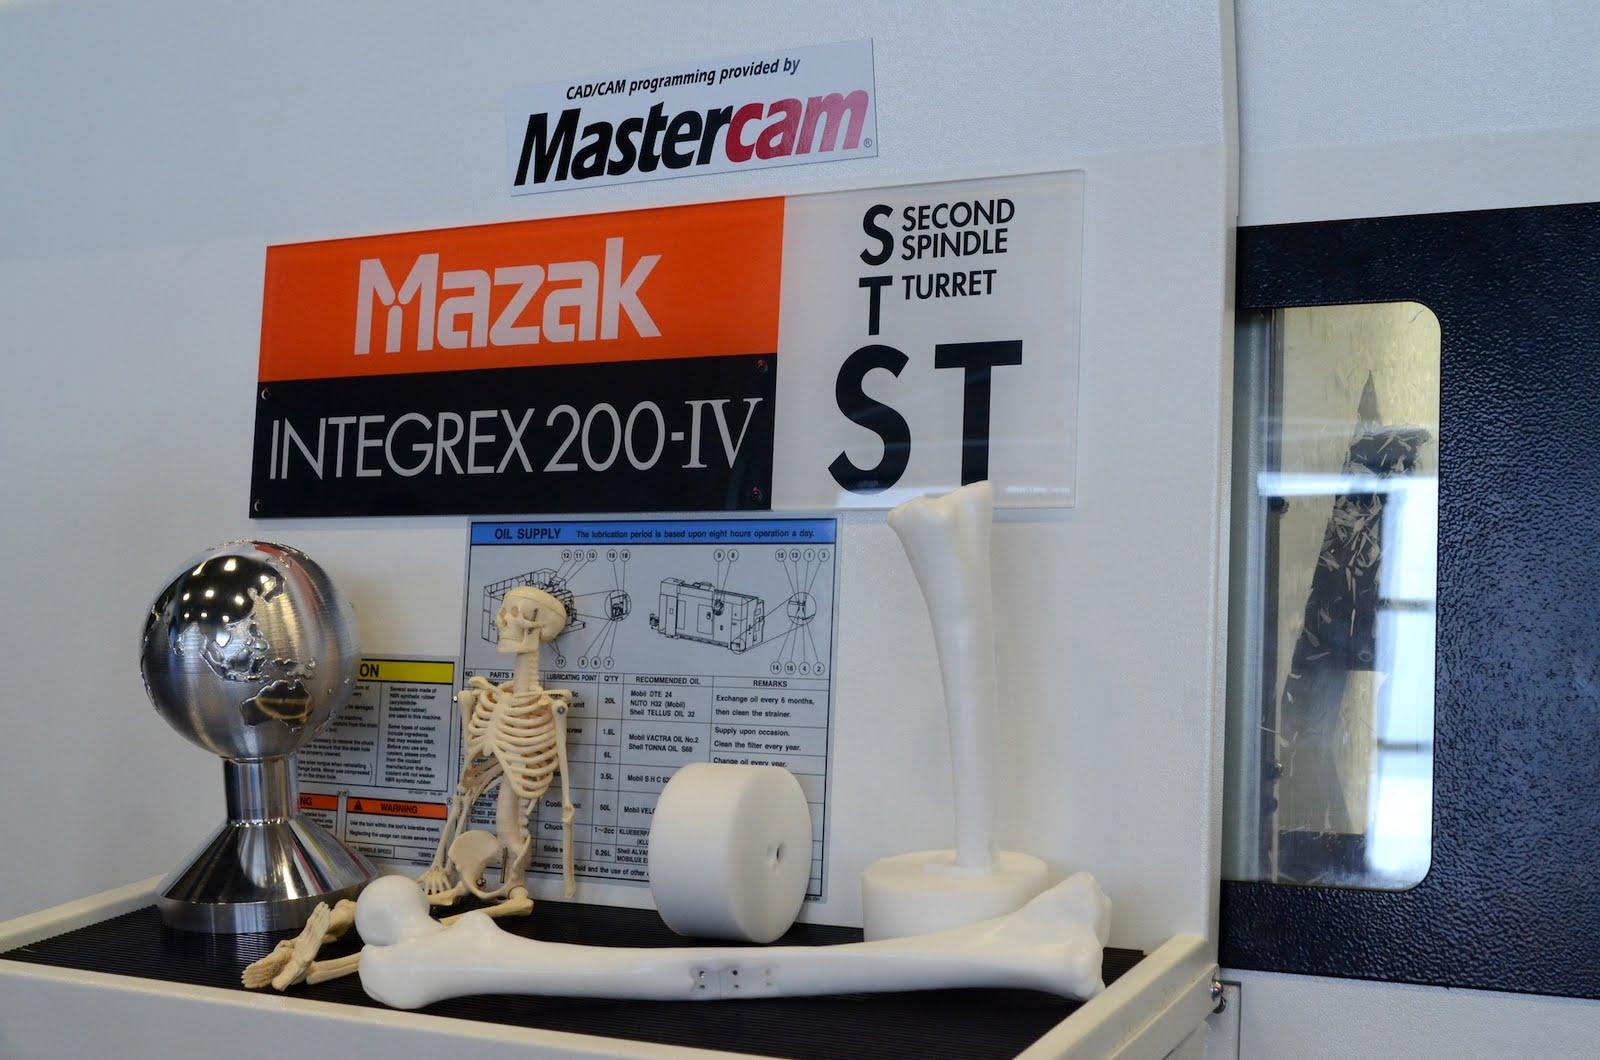 Mastercam post processor for Mazak